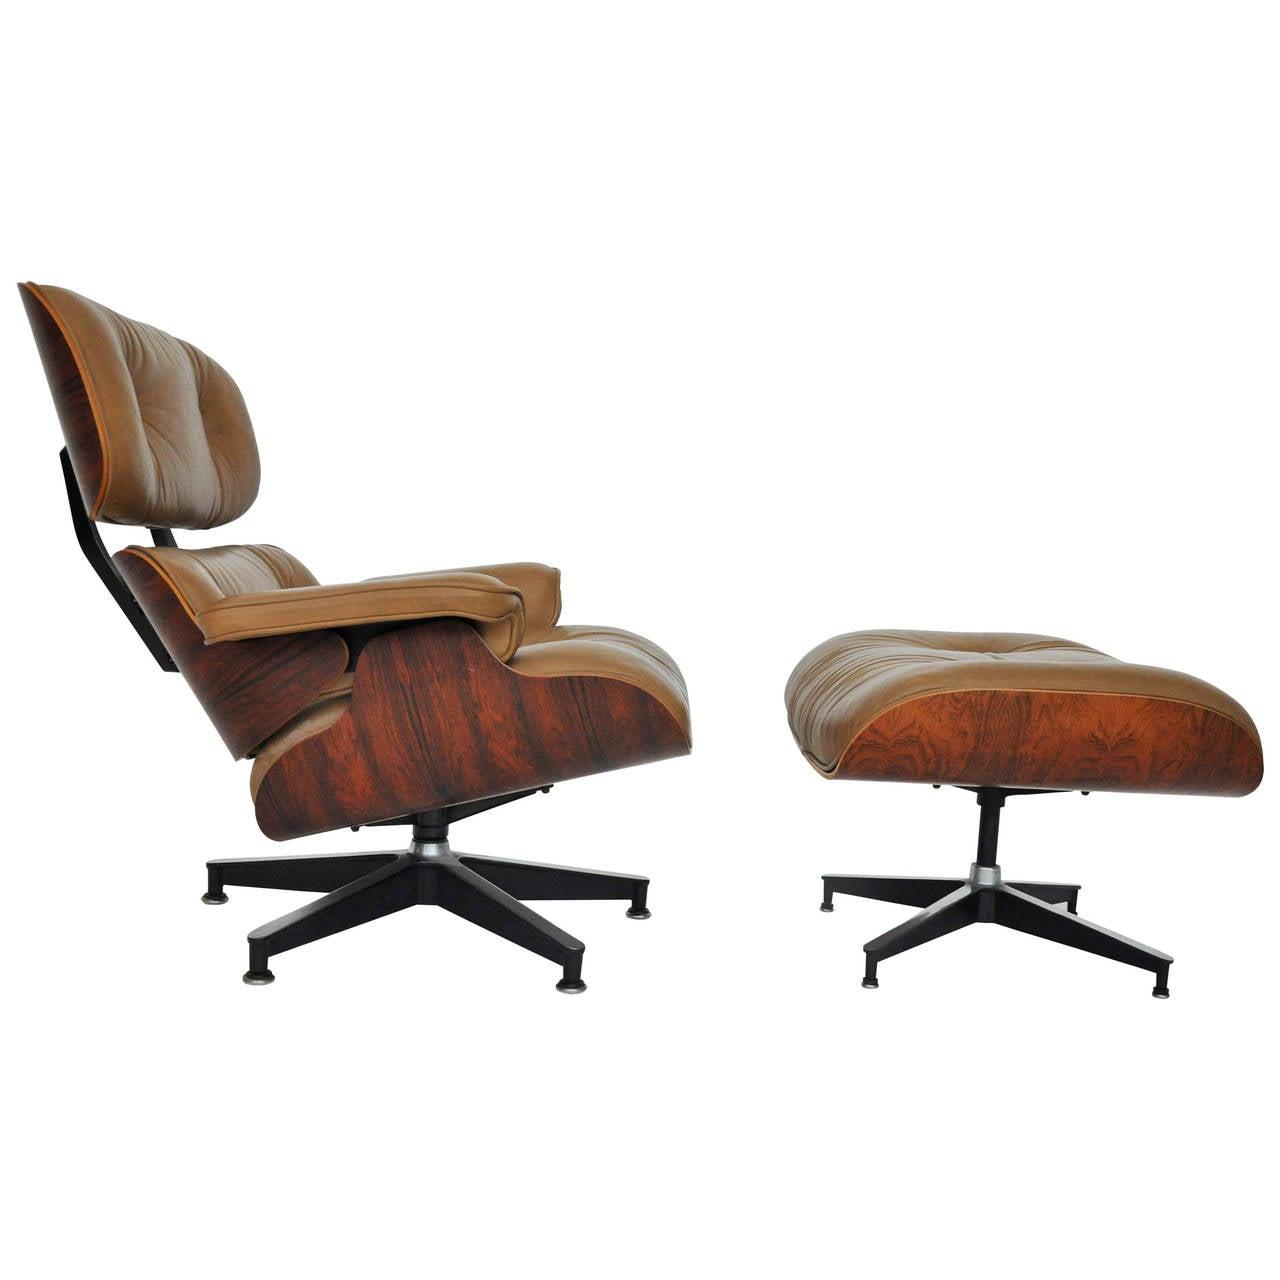 rosewood charles eames lounge chair herman miller at 1stdibs. Black Bedroom Furniture Sets. Home Design Ideas